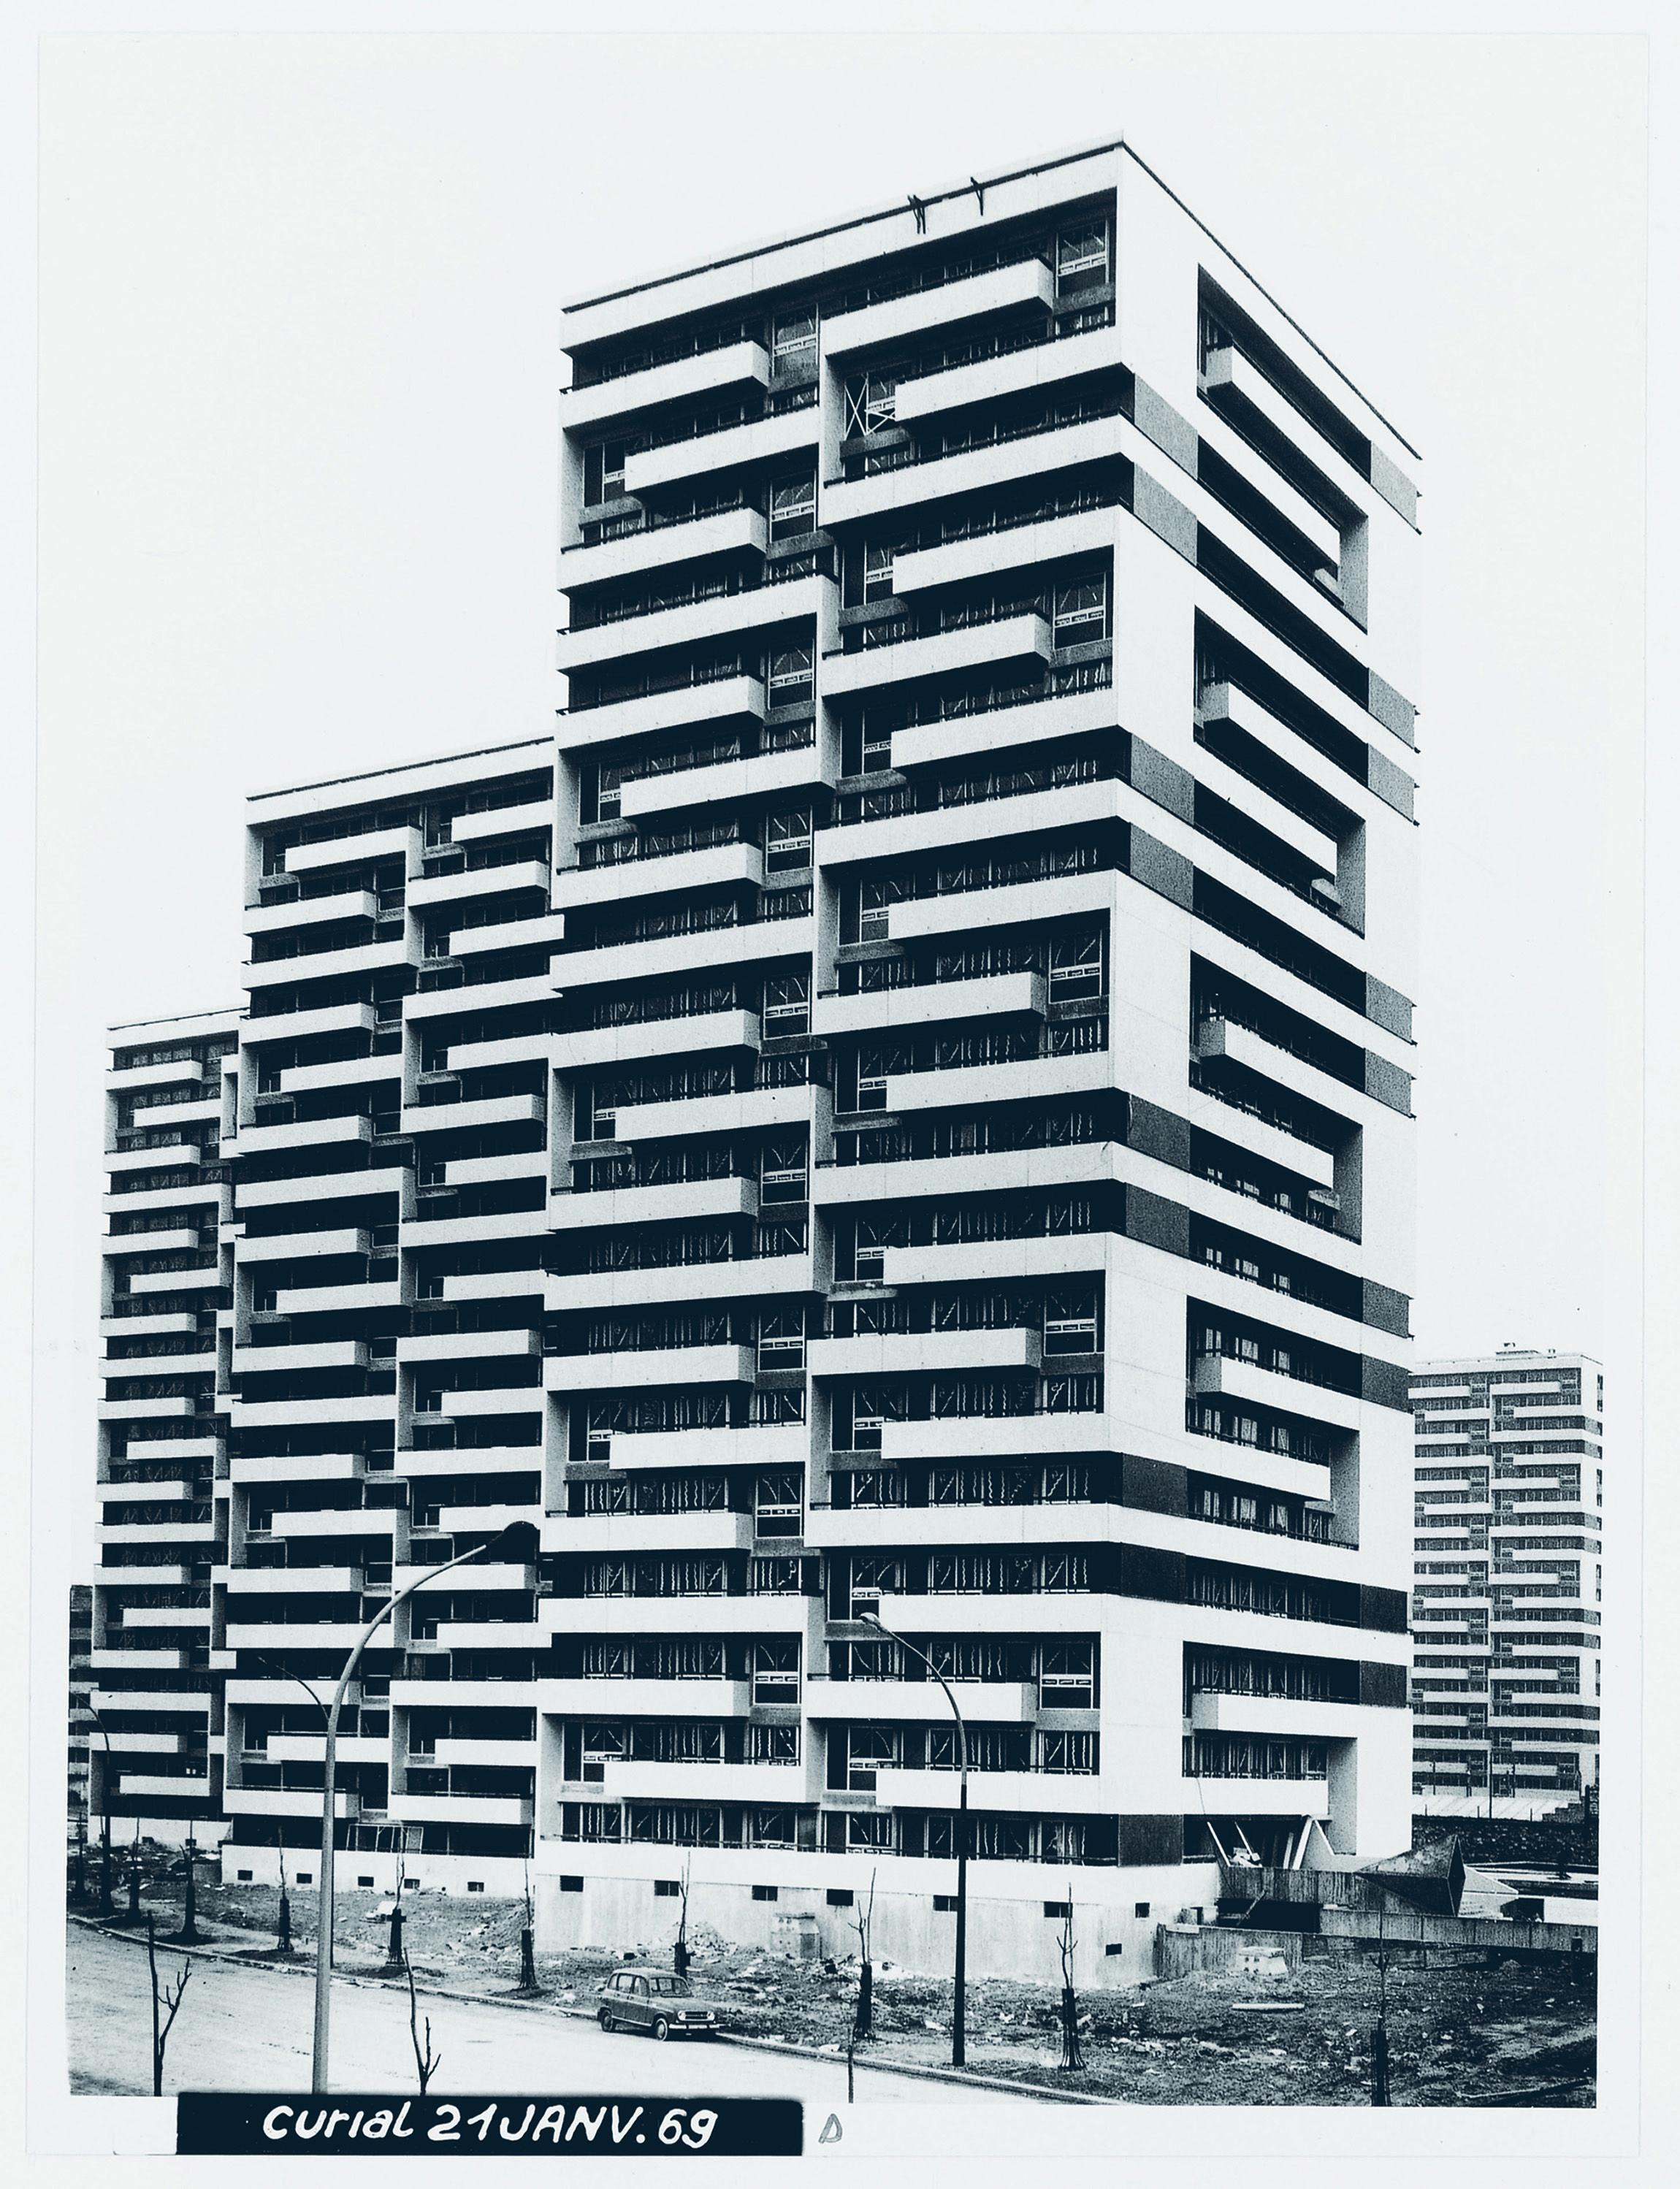 Architecte Cambrai 5/ curial - cambrai g. tessier andré n. coquet / henri auffret / d